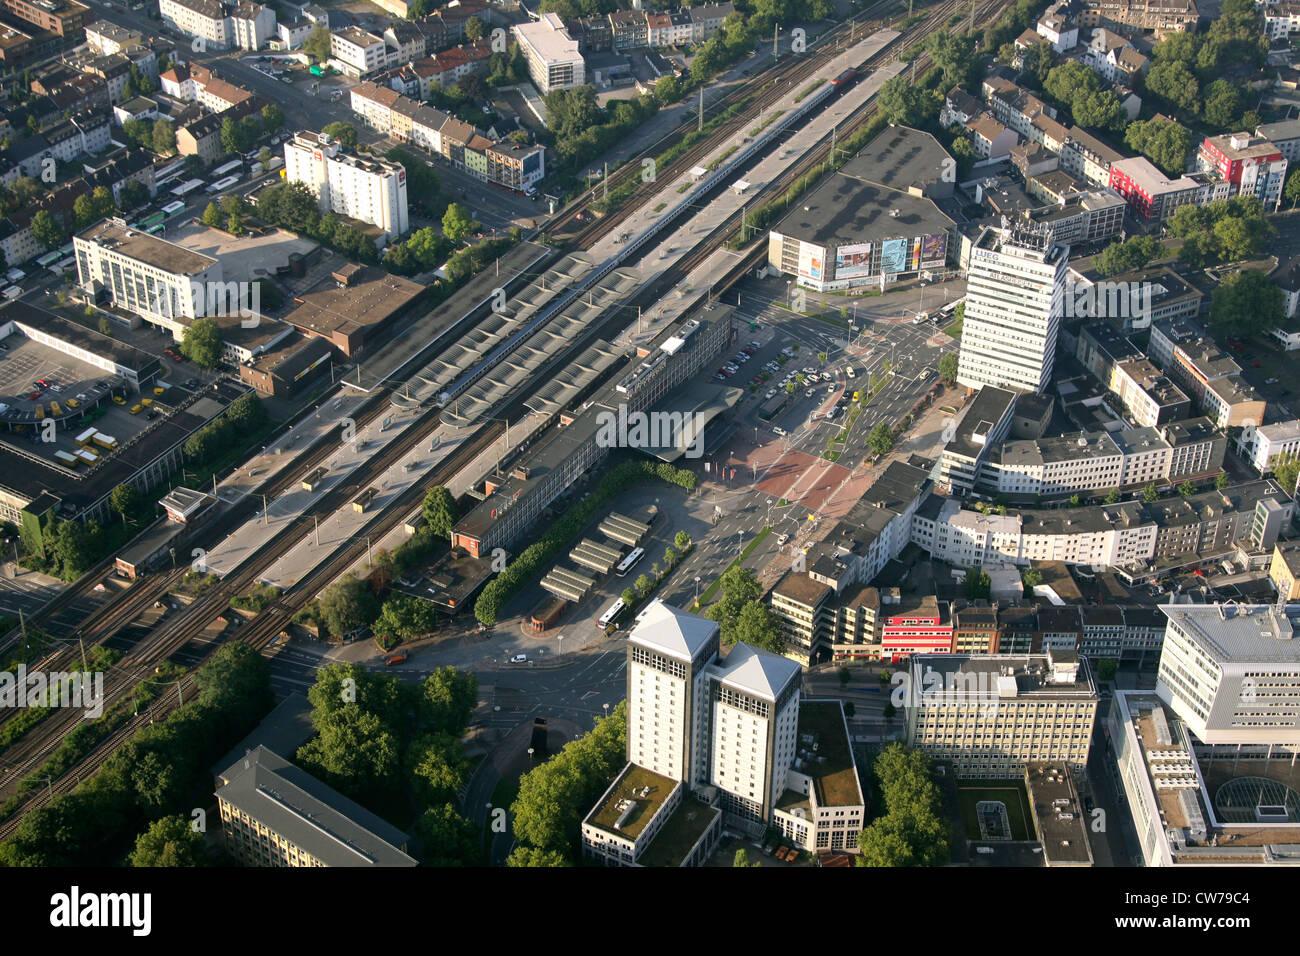 main station of Bochum at Suedring, Germany, North Rhine-Westphalia, Ruhr Area, Bochum - Stock Image